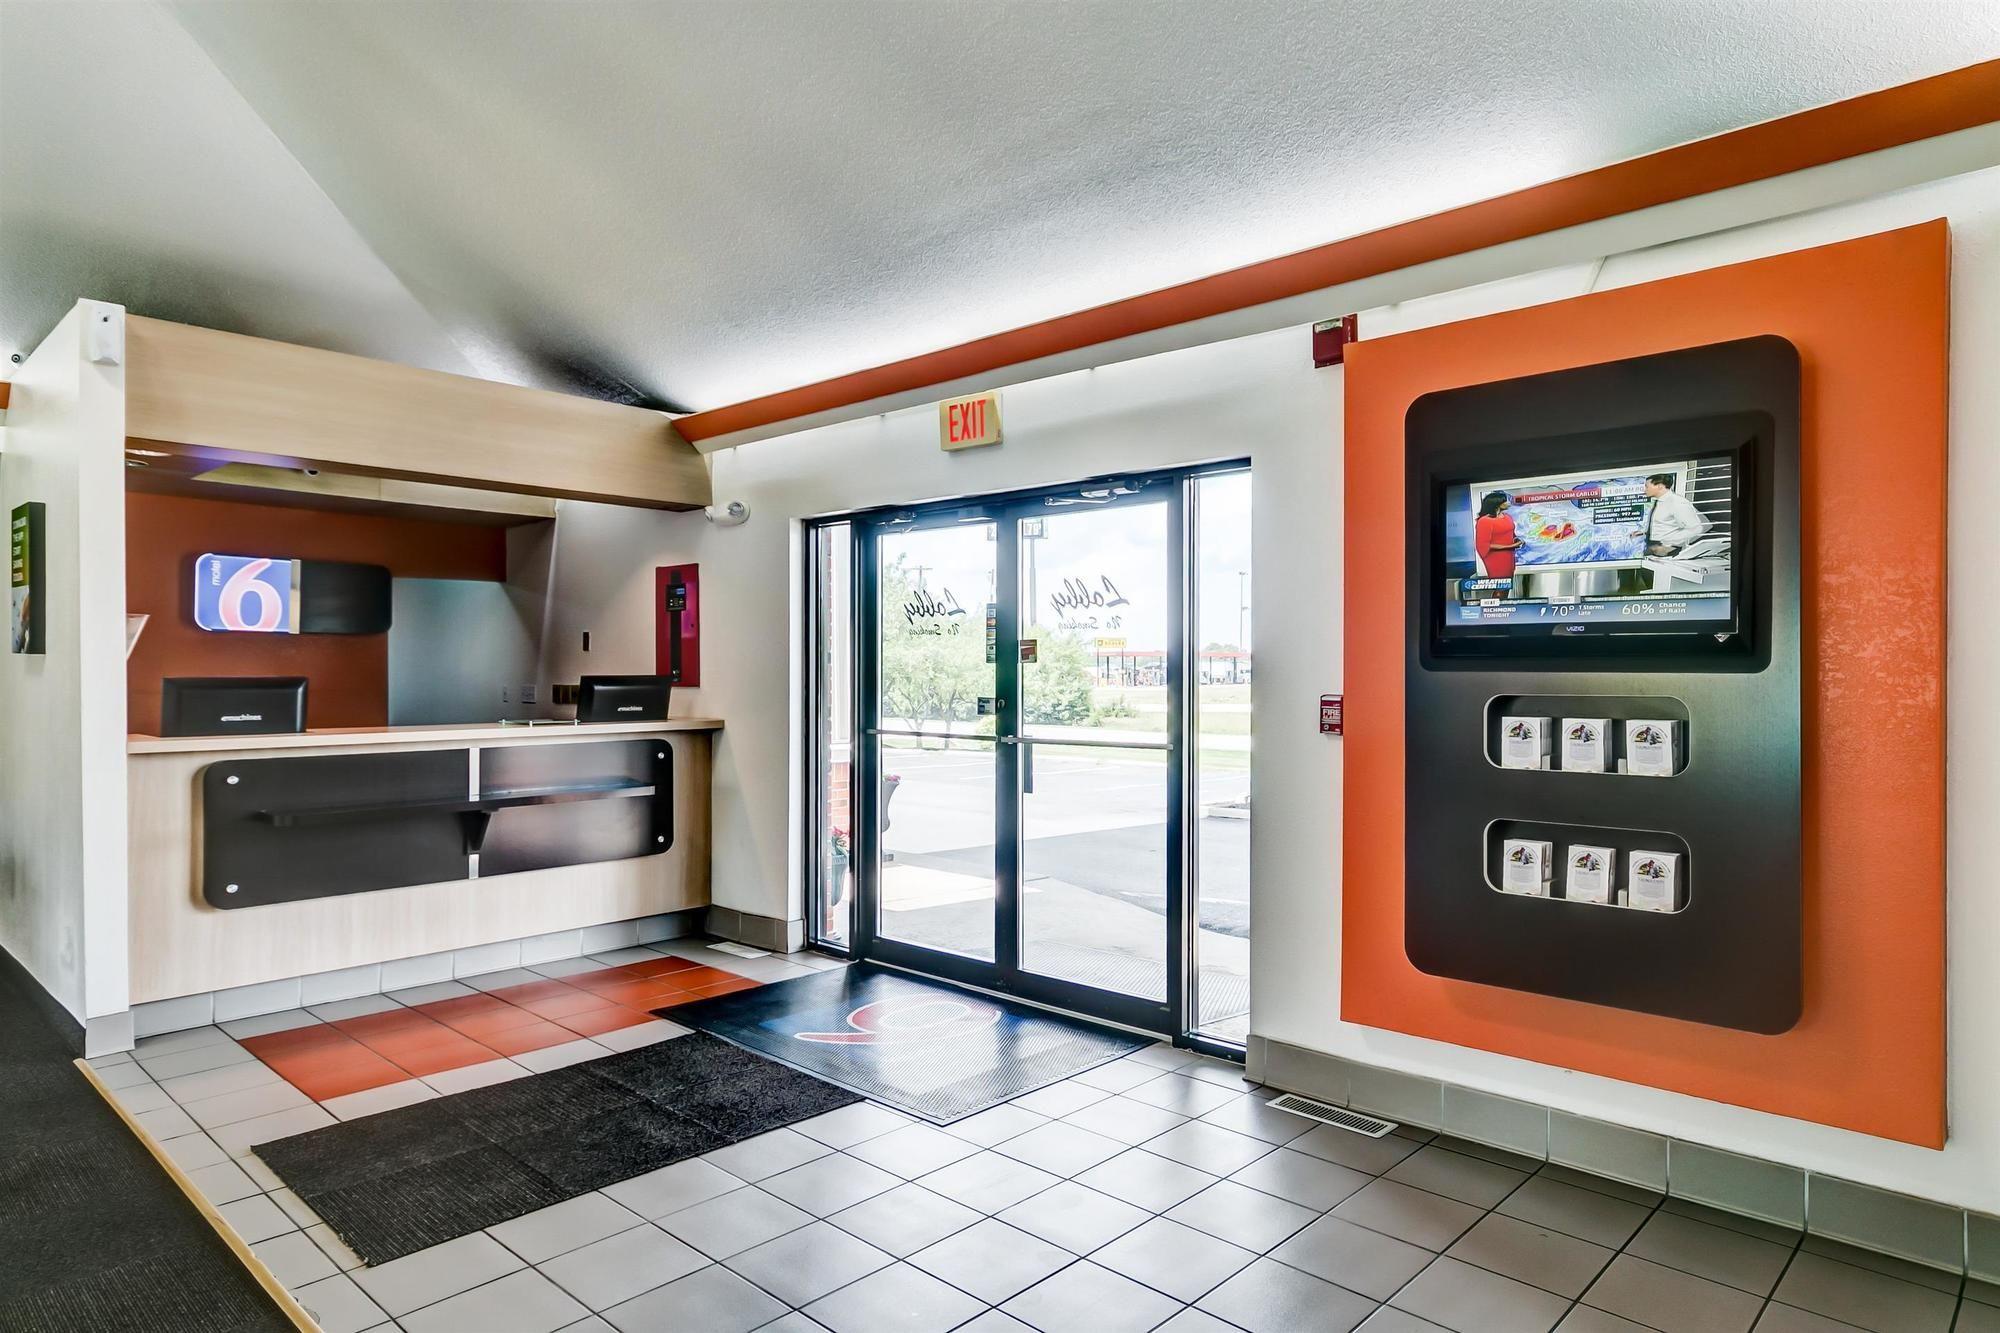 Motel 6 Georgetown - Lexington North in Georgetown, KY